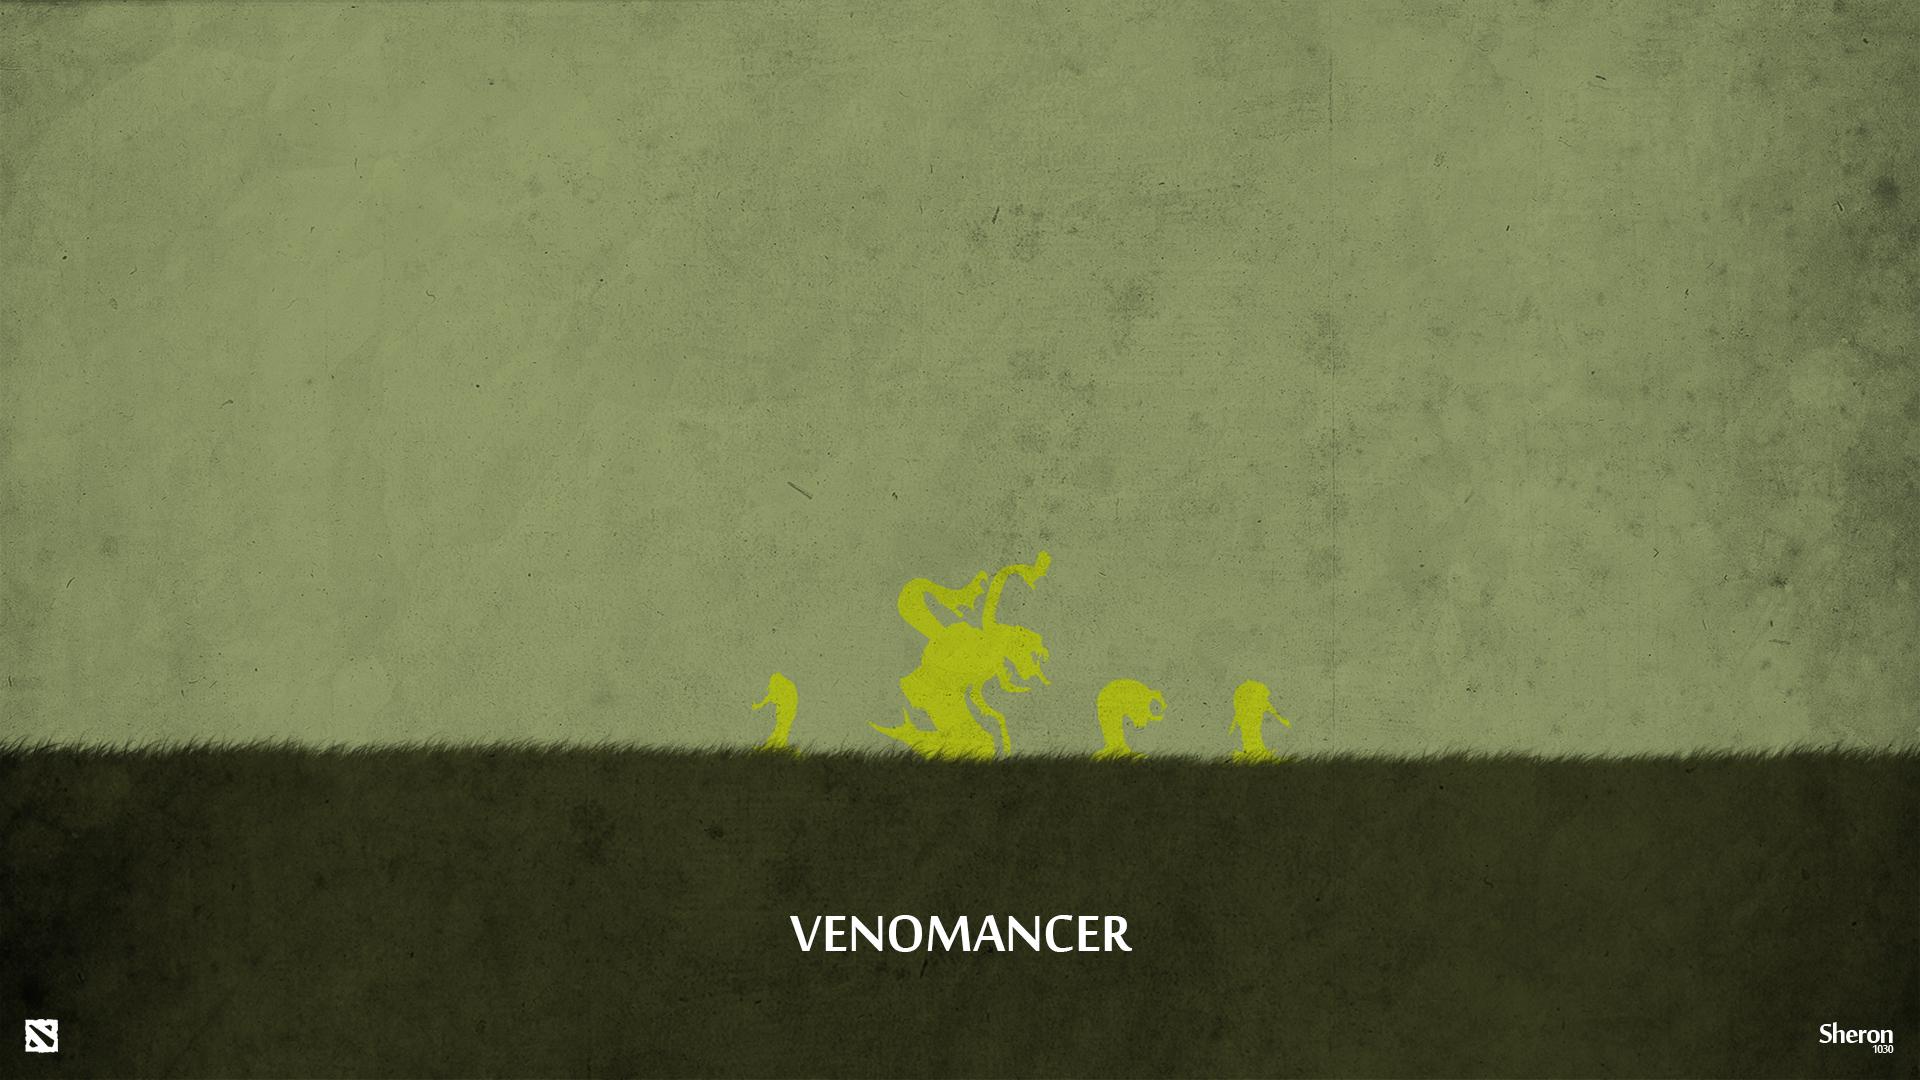 dota 2 venomancer wallpaper by sheron1030 on deviantart